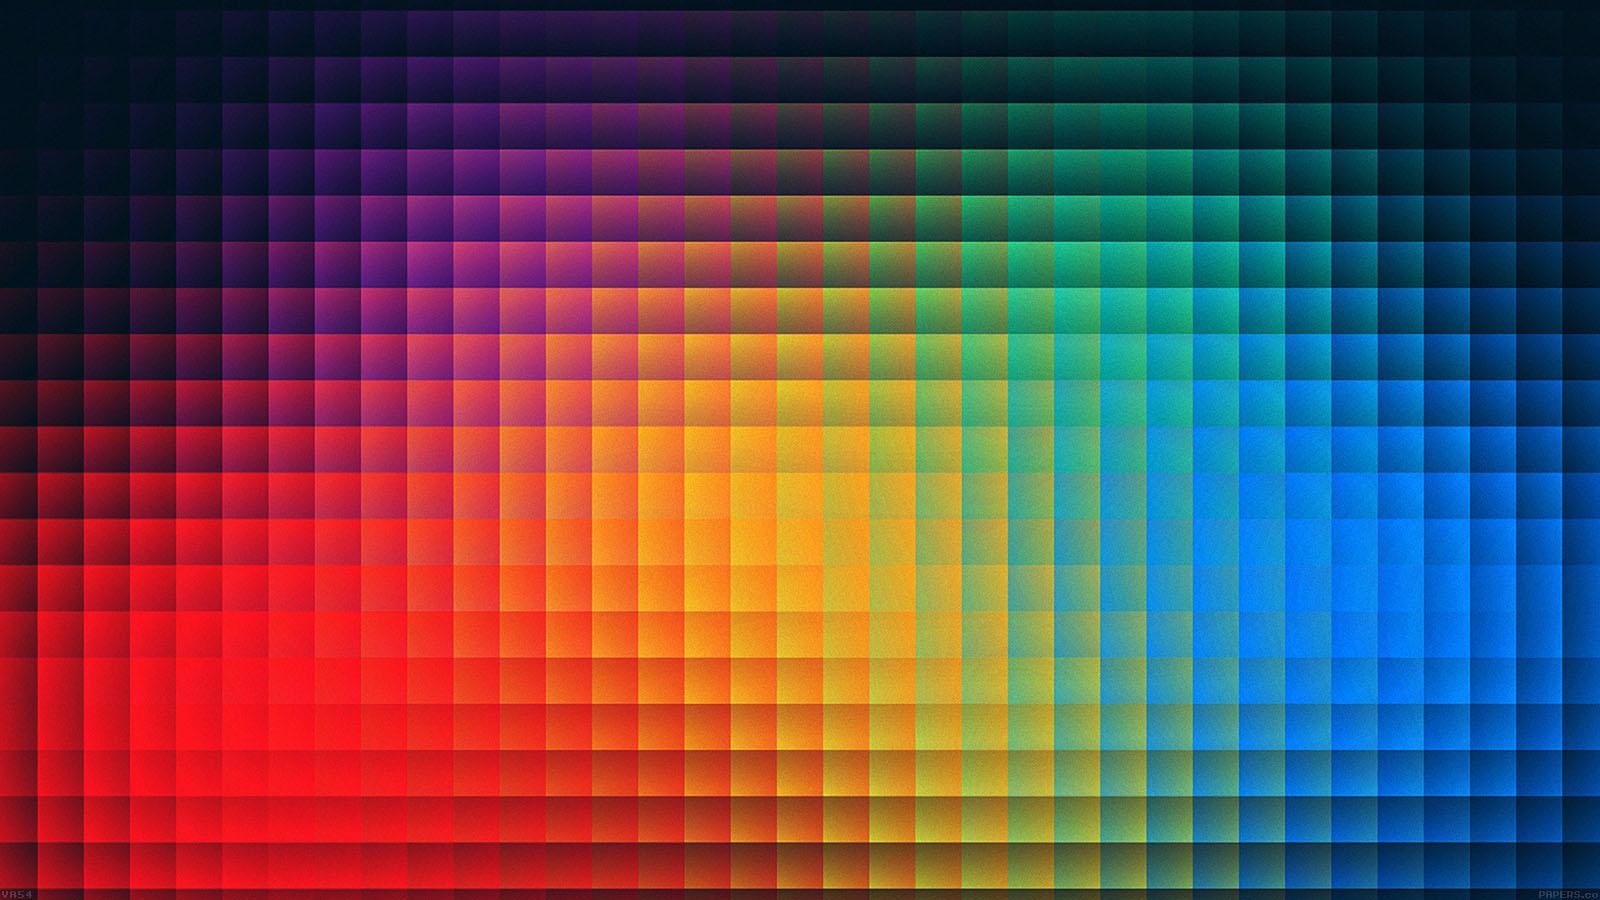 Fall Pixel Art Iphone Wallpaper Va54 Rainbow Pixels Pattern Papers Co